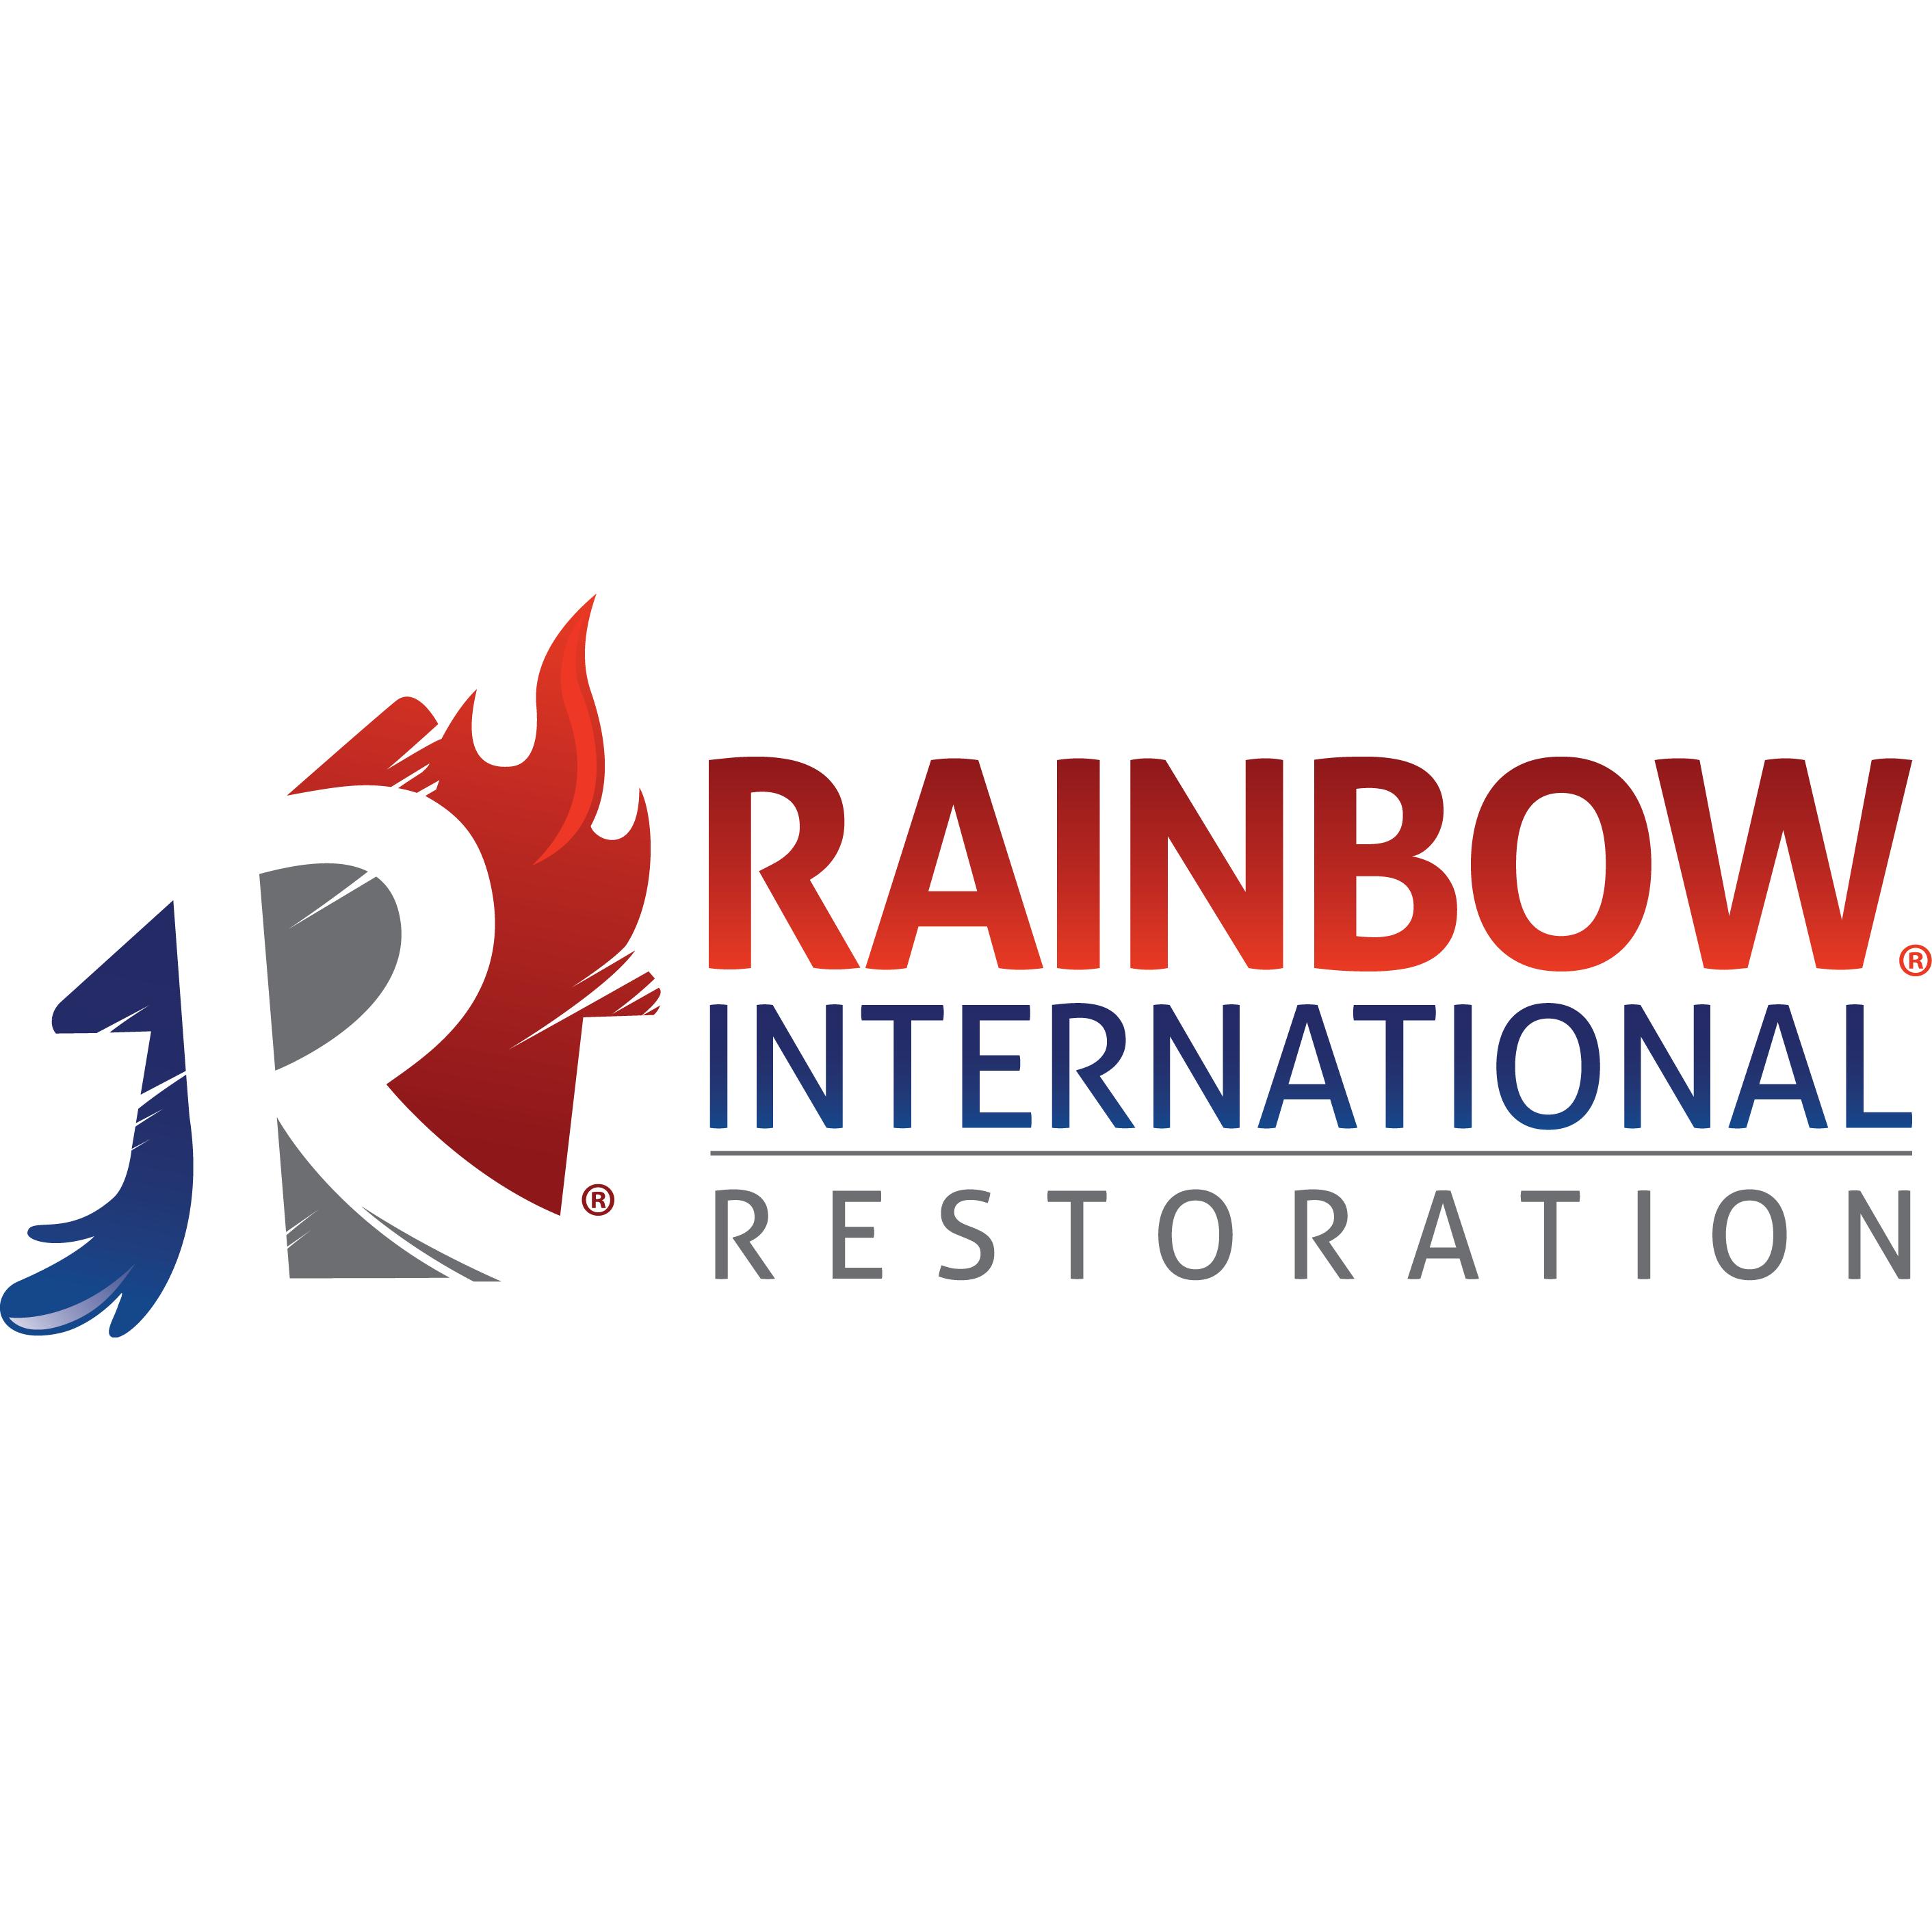 Rainbow International of The Woodlands - Spring, TX 77389 - (832)436-2451 | ShowMeLocal.com